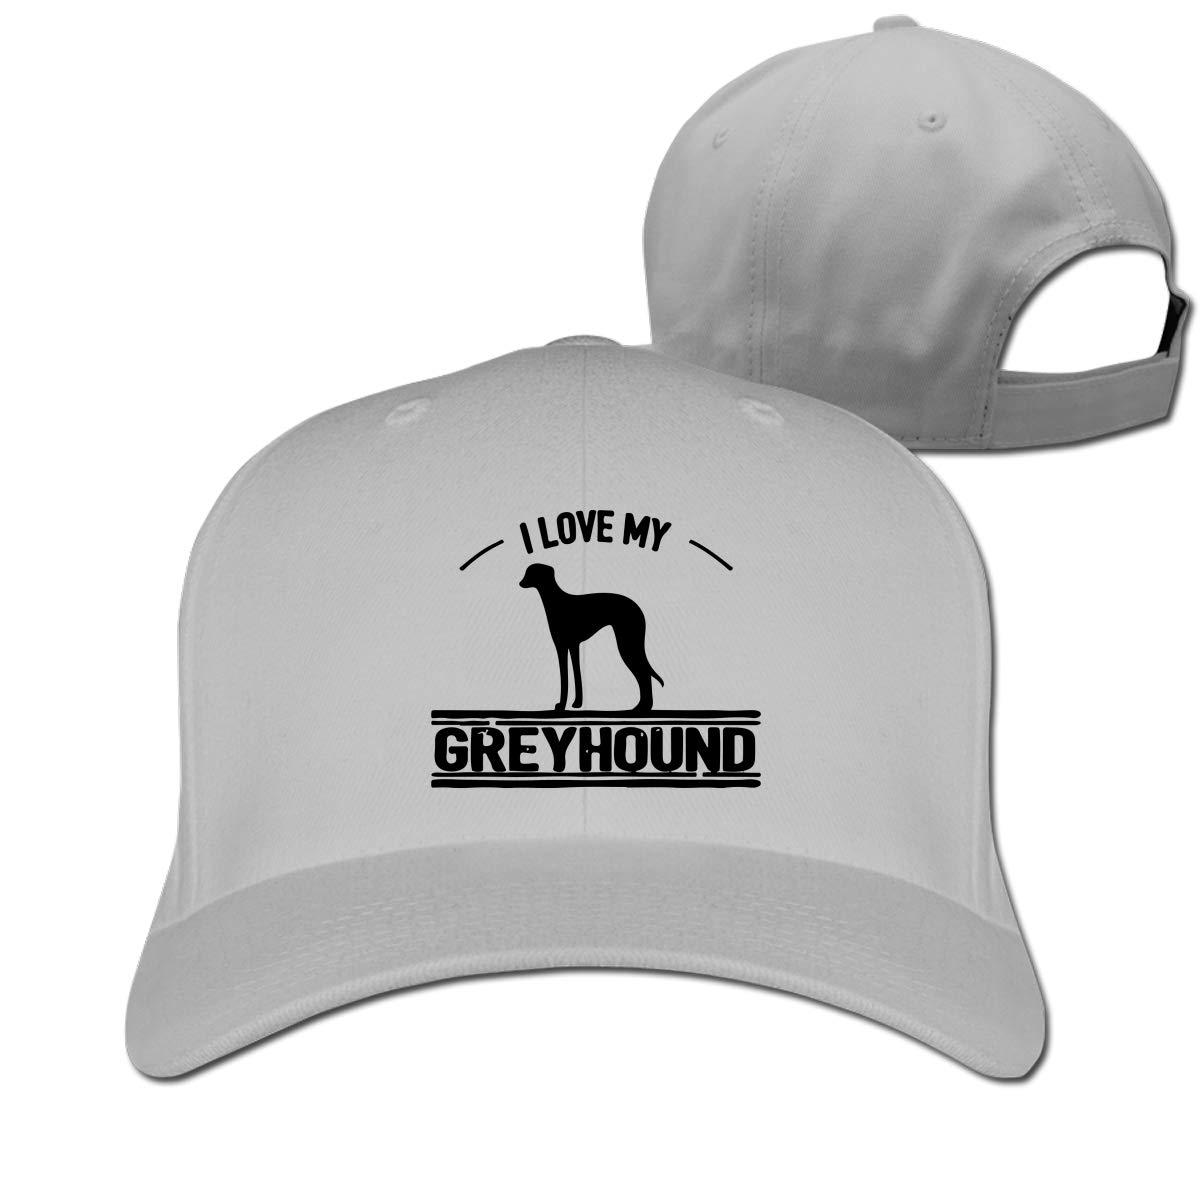 I Love My Greyhound Dog-1 Unisex Pure Color Baseball Cap Classic Adjustable Visor Hat